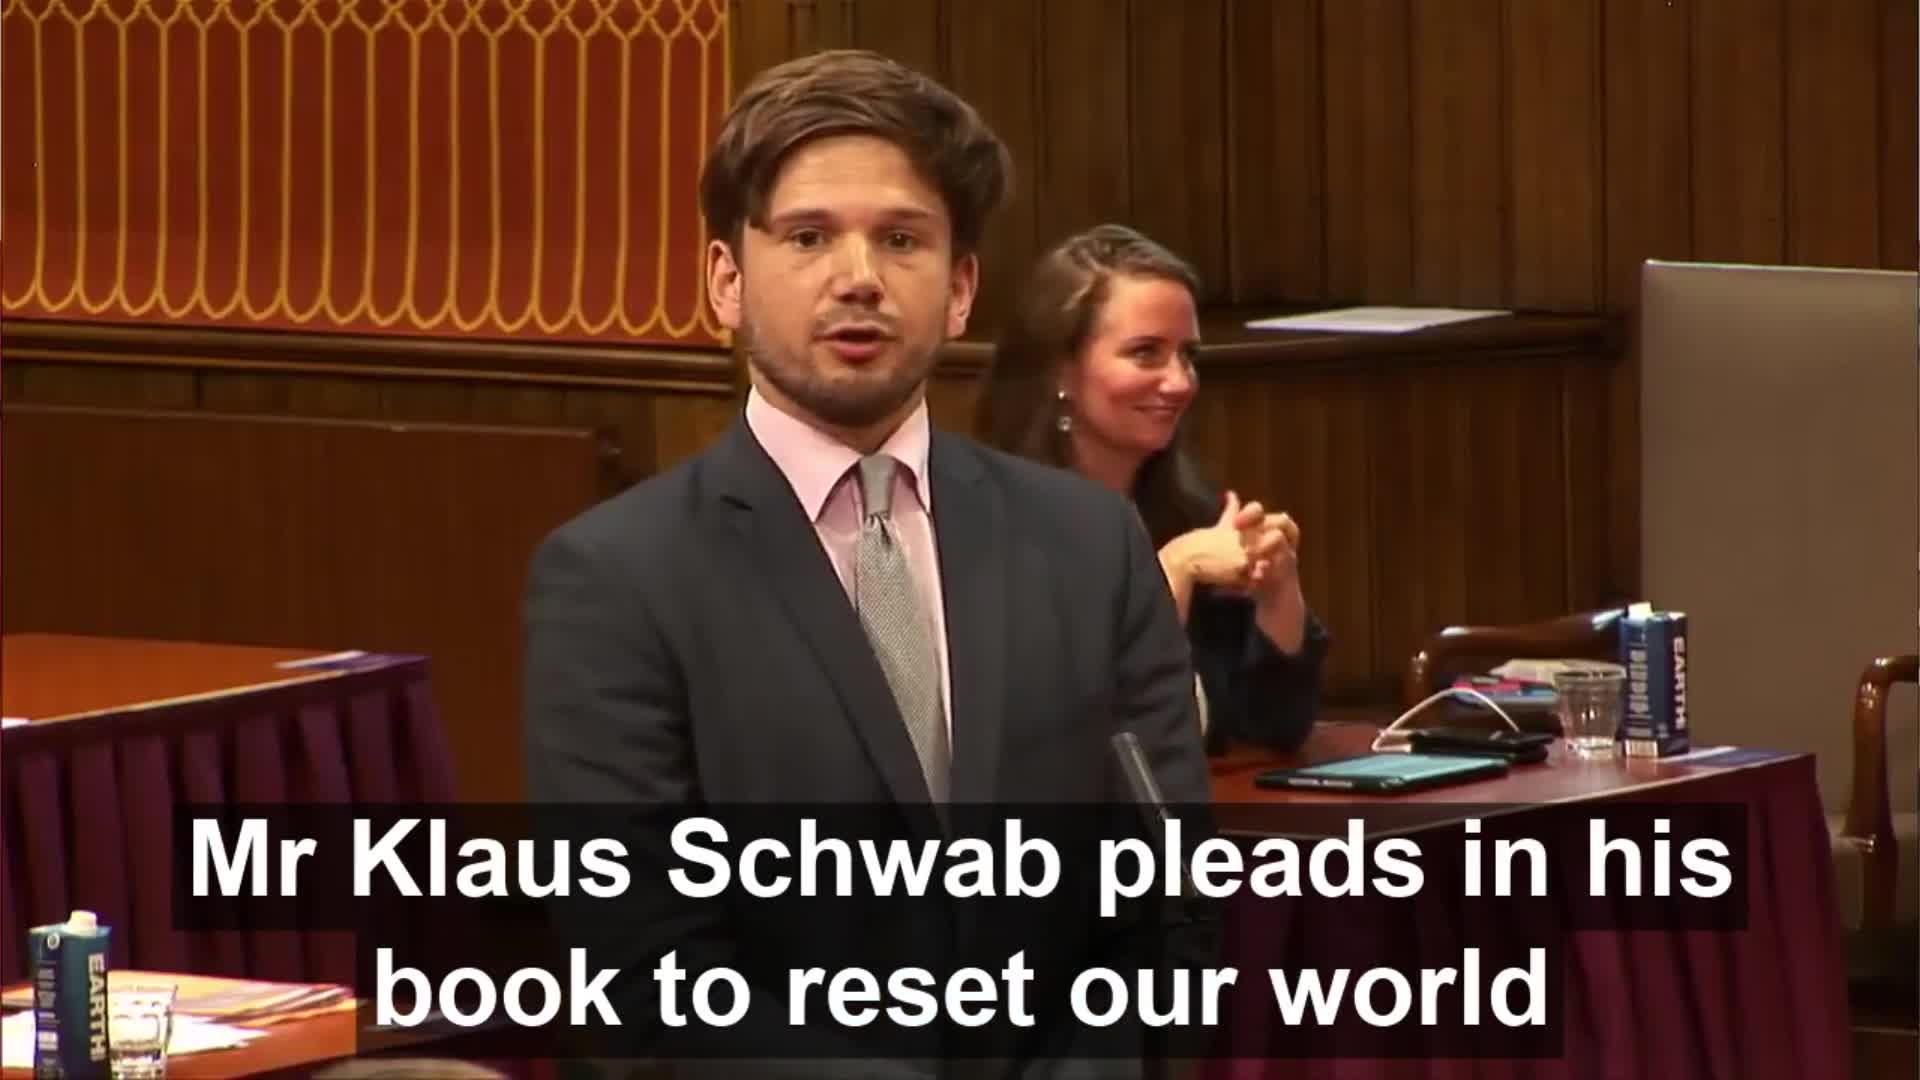 Dutch Politician Gideon van Meijeren confronts Prime-Minister Mark Rutte with The Great-Reset